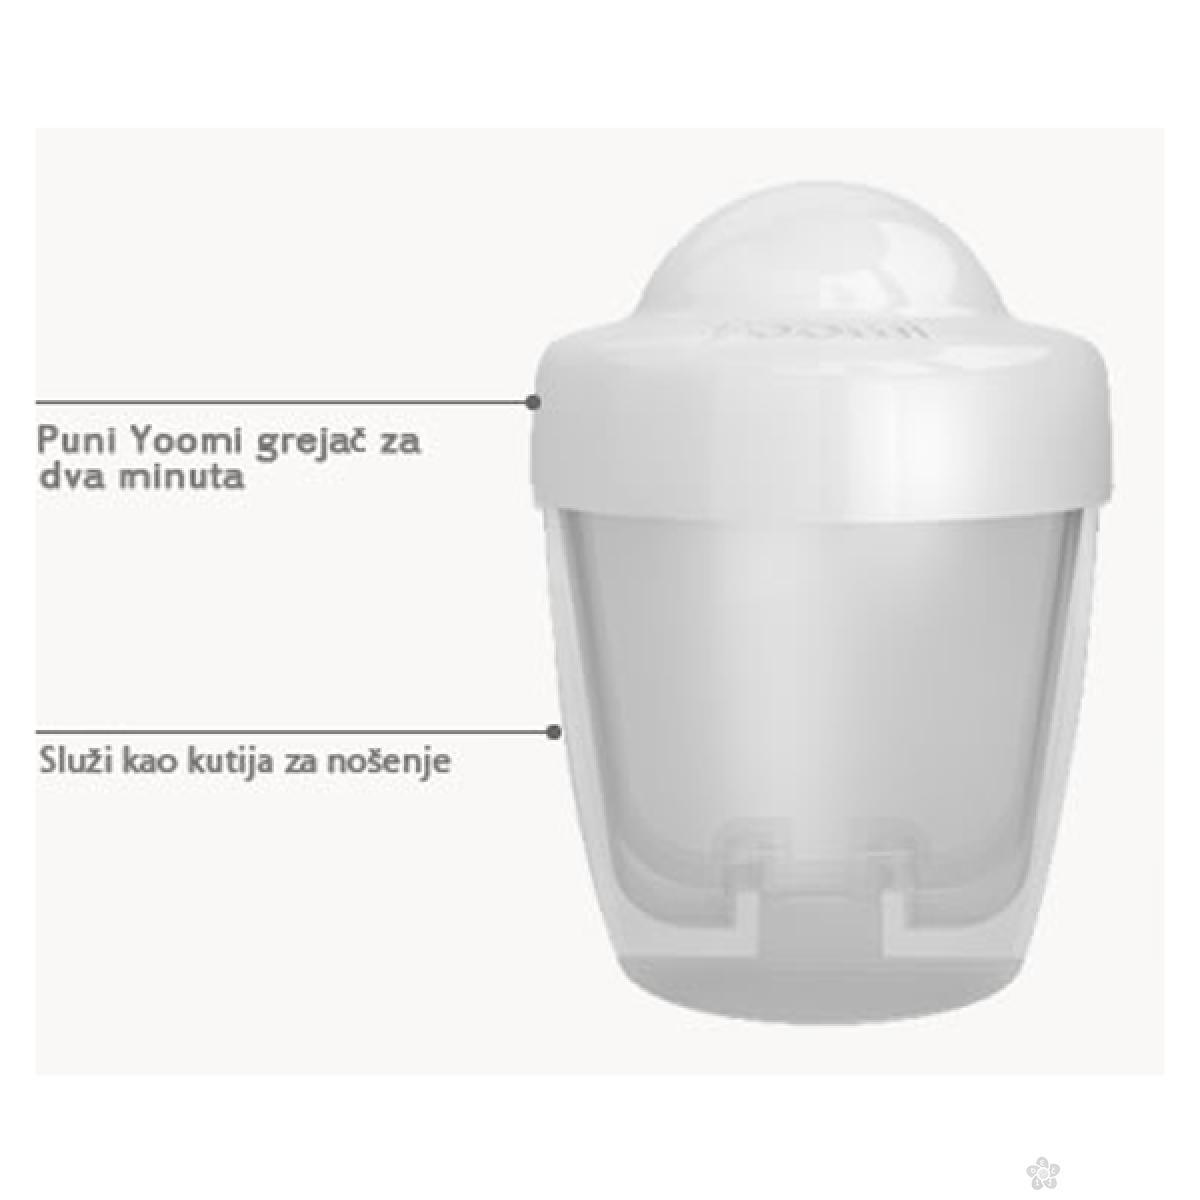 Set bočica 140 ml+grejač+cucla sa malim otvorom+kutija za grejač Yoomi, Y15B1W1P